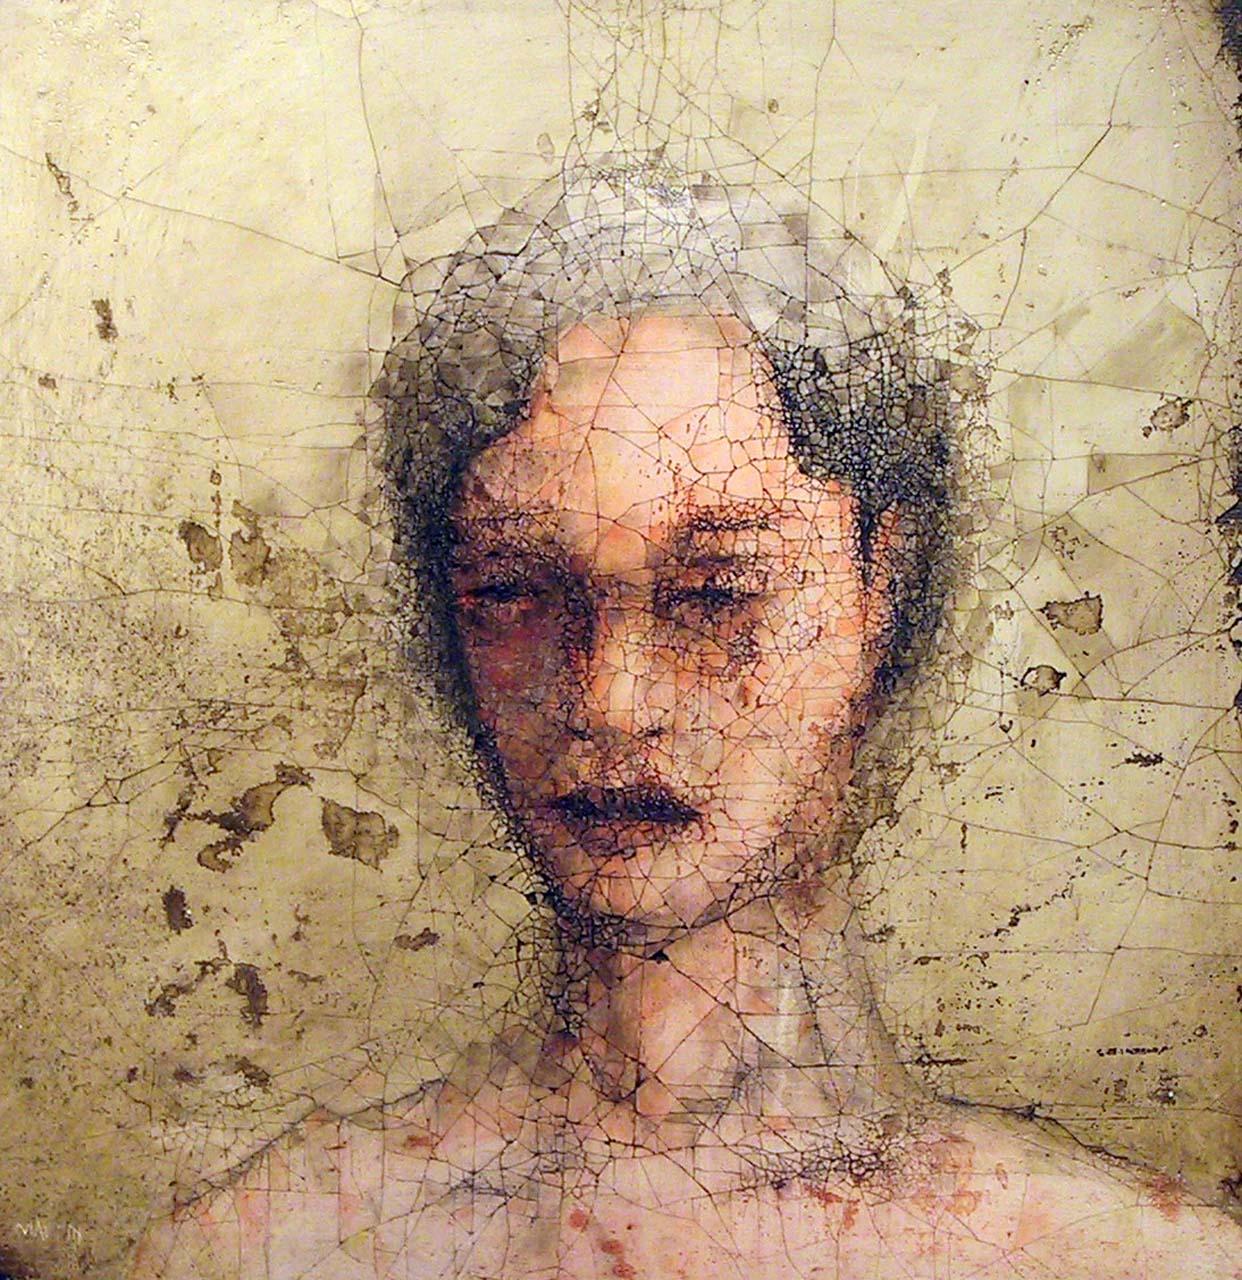 Zenith Gallery-Stephen Maffin-Emmy Alone-2003-Plaster on Burlap- 32h x 32w - $3,200.jpg